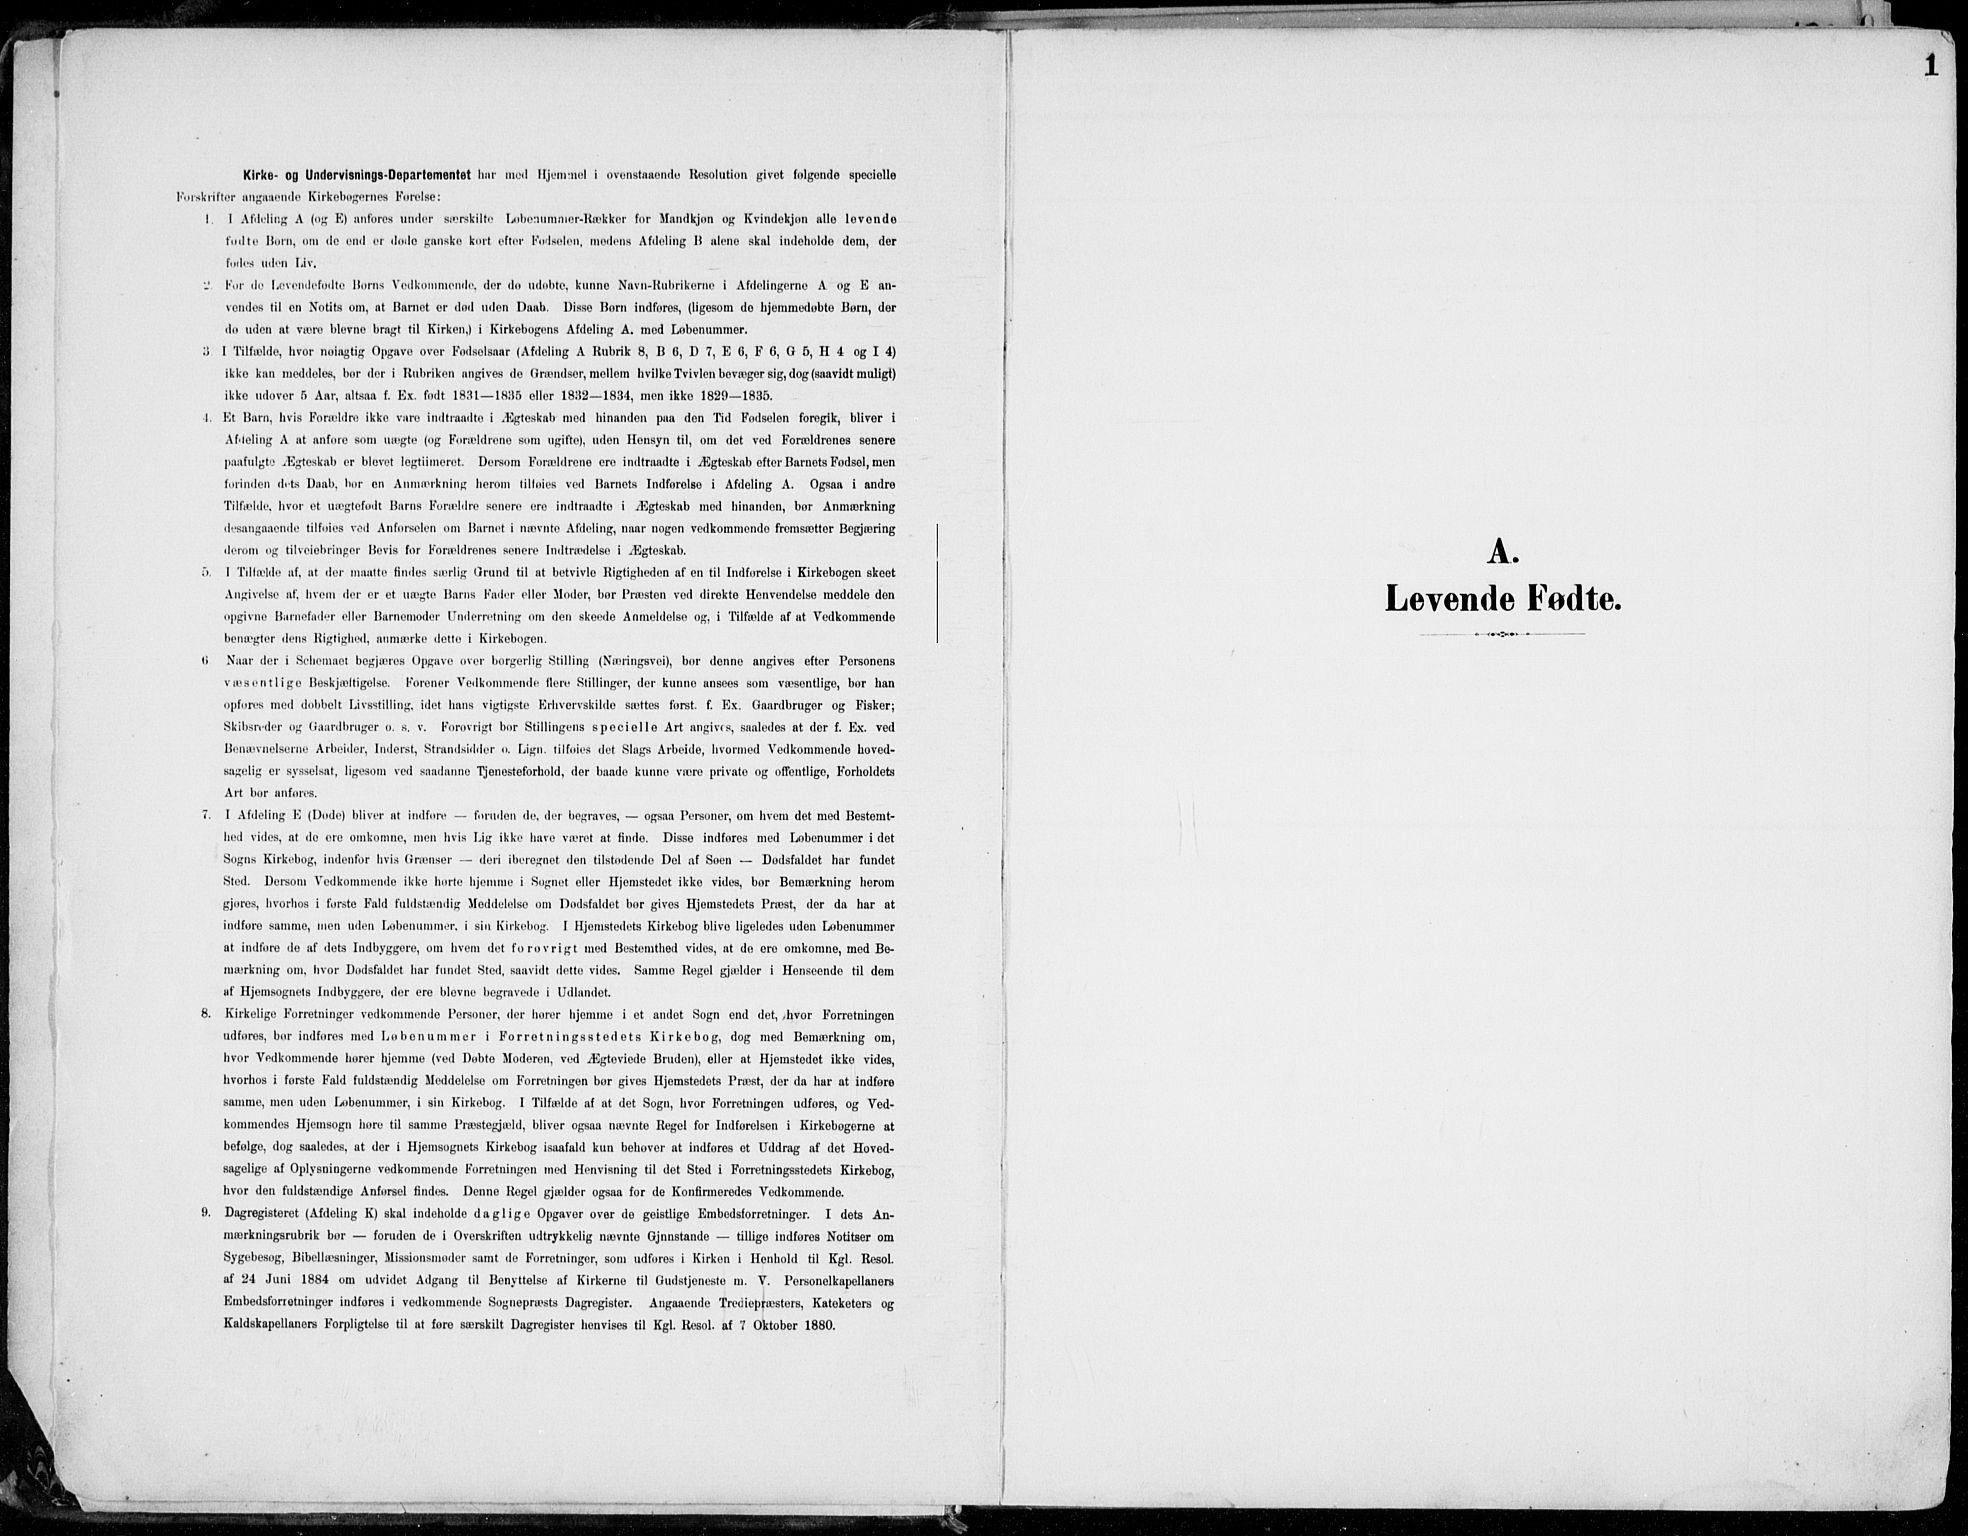 SAH, Lillehammer prestekontor, Ministerialbok nr. 1, 1901-1916, s. 1